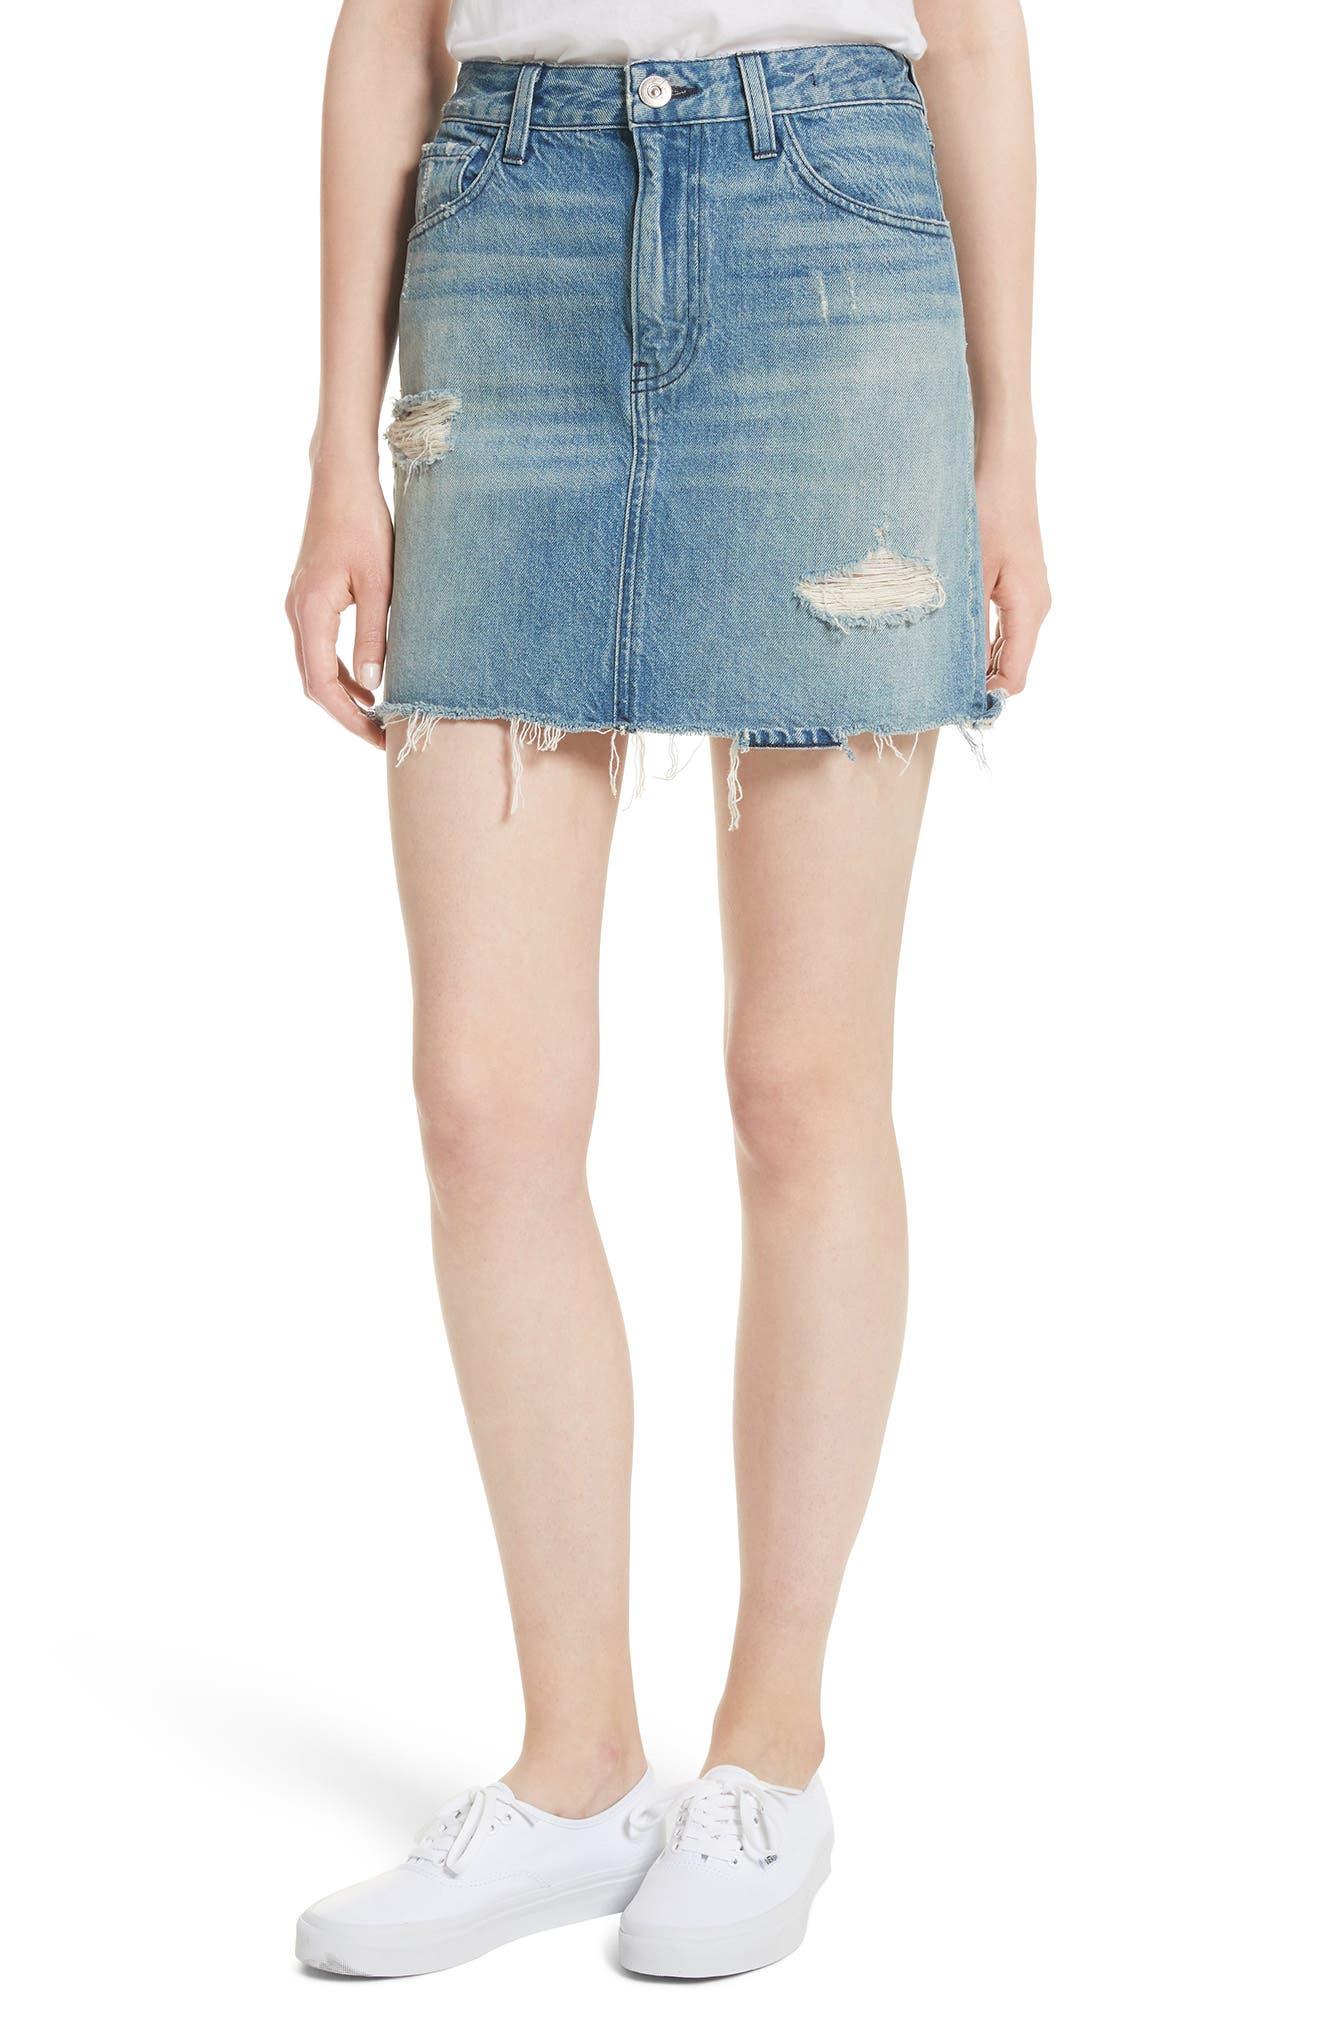 Celine Distressed Denim Skirt,                             Main thumbnail 1, color,                             Laz